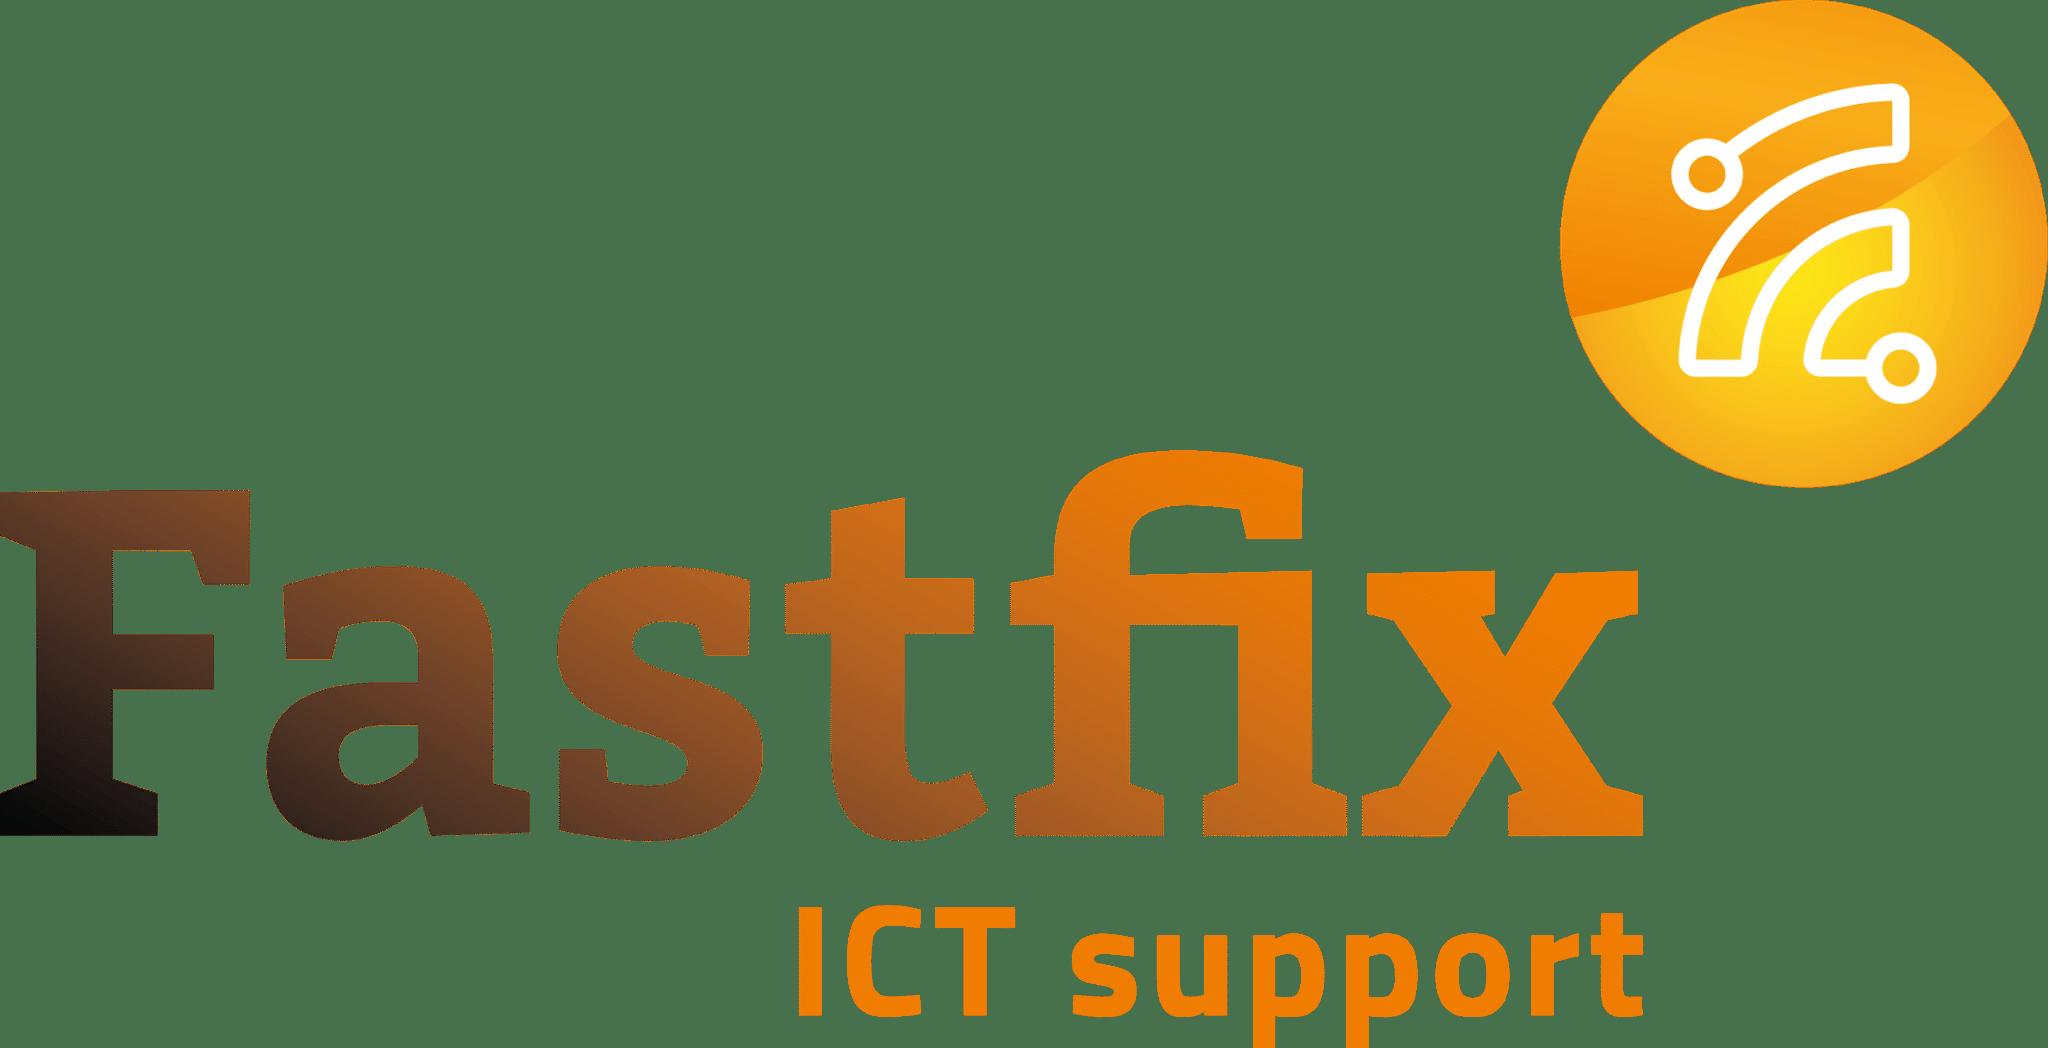 Fastfix ICT Support